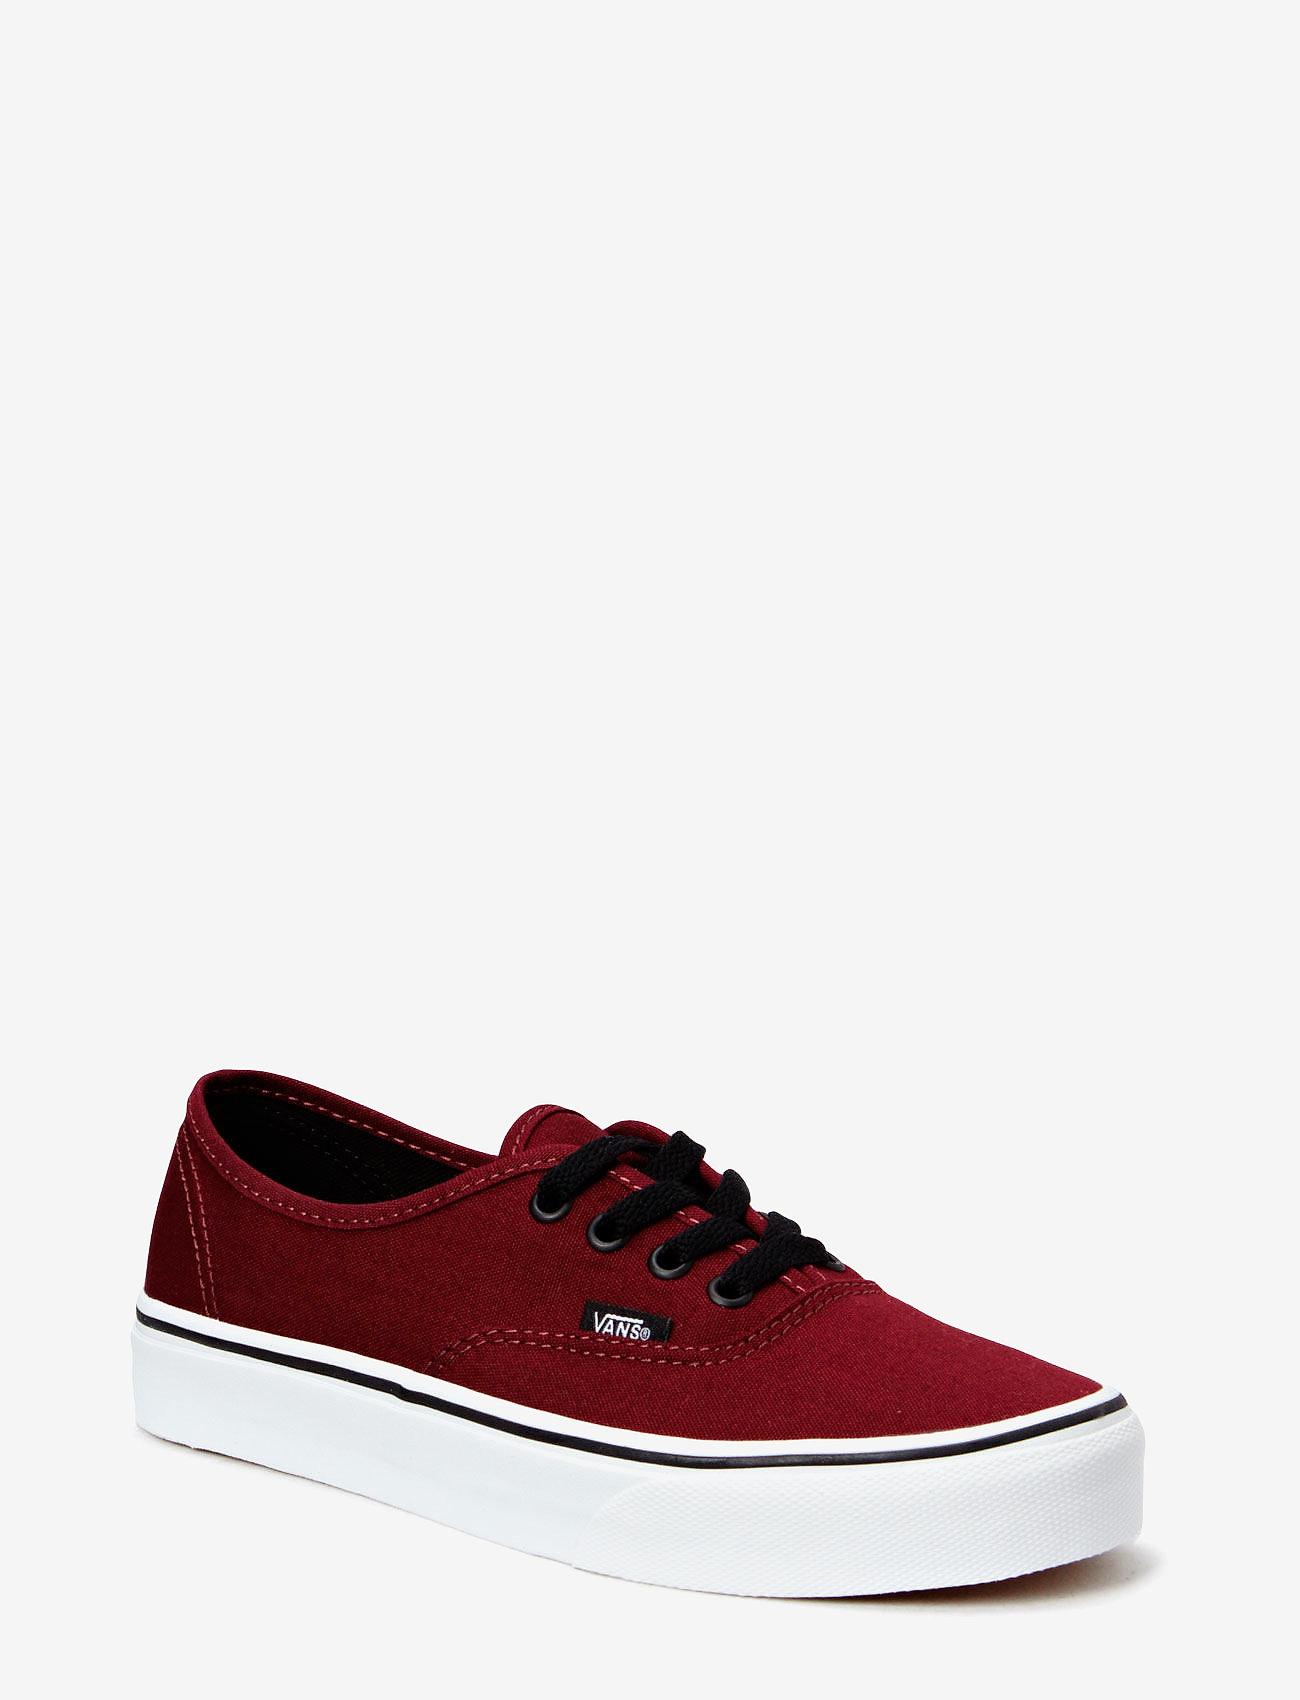 VANS - UA Authentic - laag sneakers - port royale/black - 0